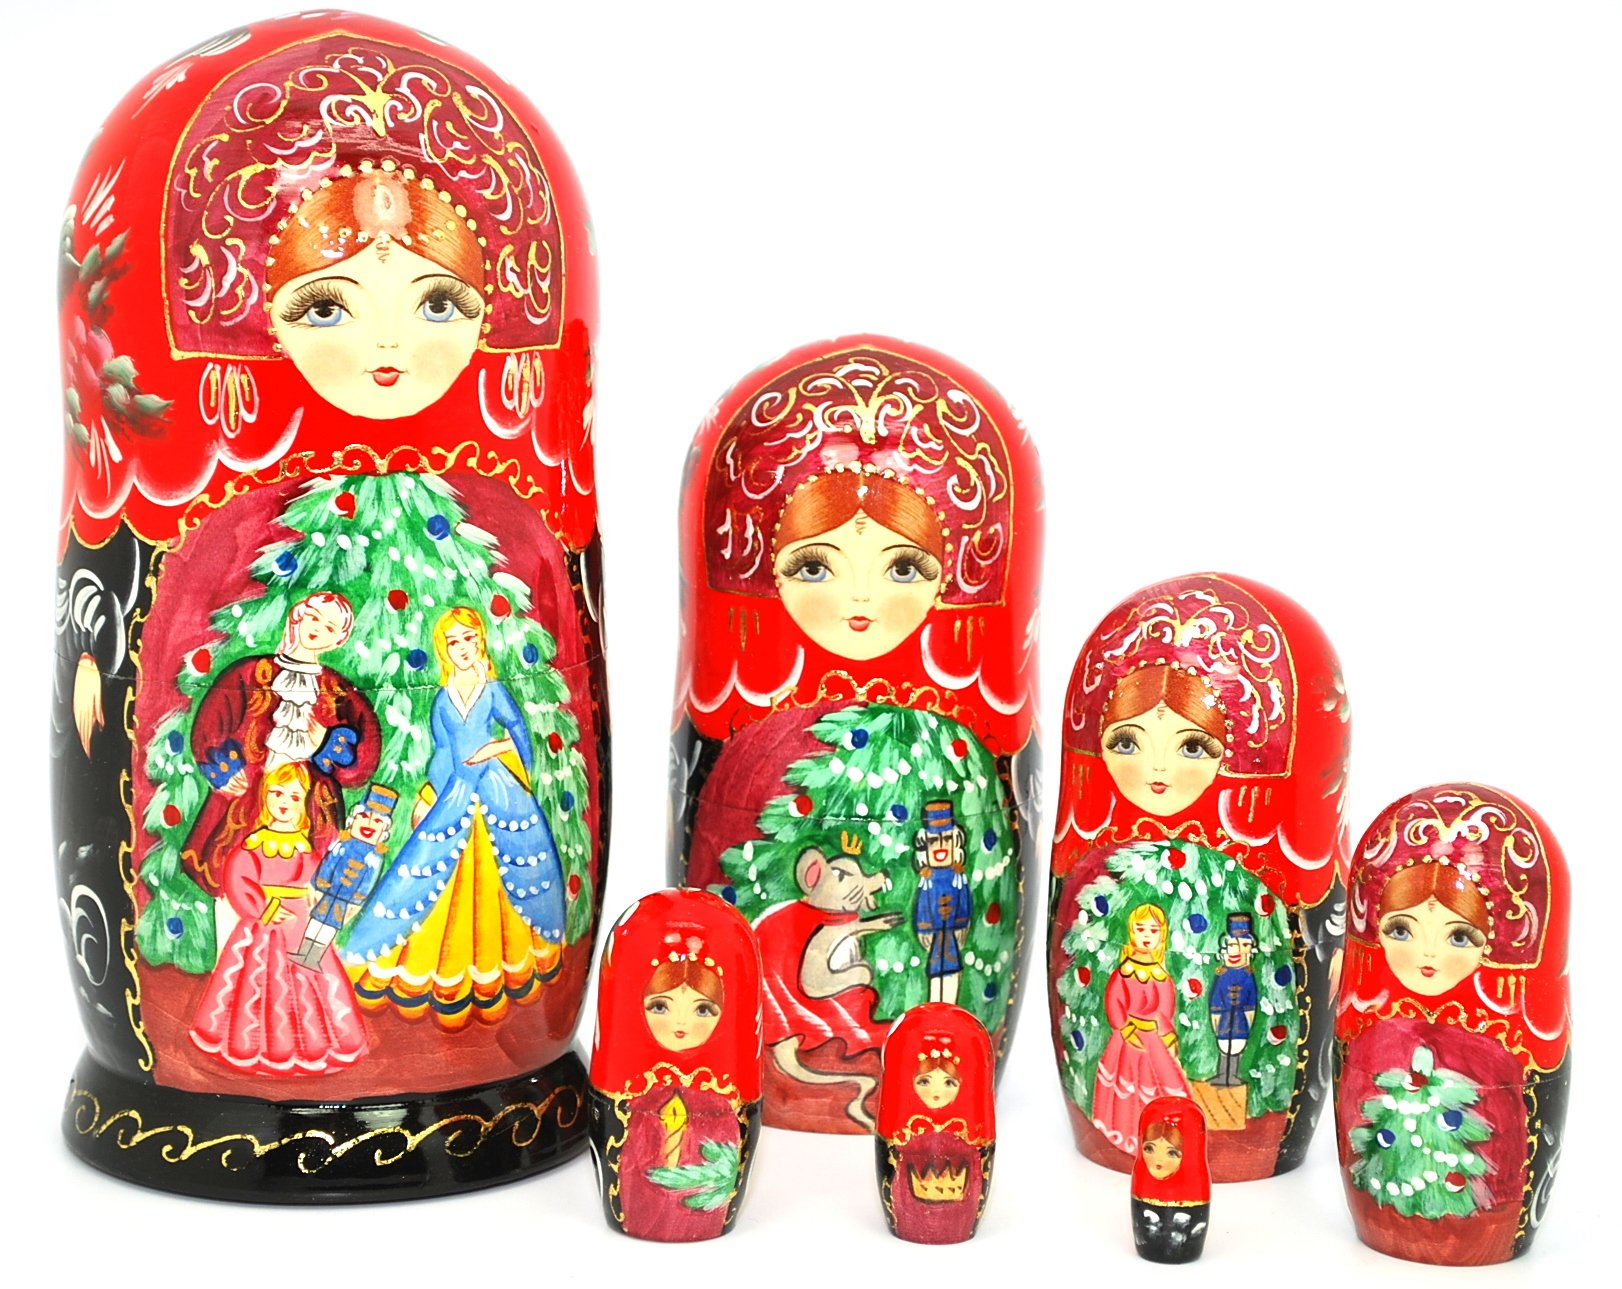 Authentic Russian Hand Painted Nutcracker Set of 7 Pcs Nesting Doll/Matryoshkas Artist Signed